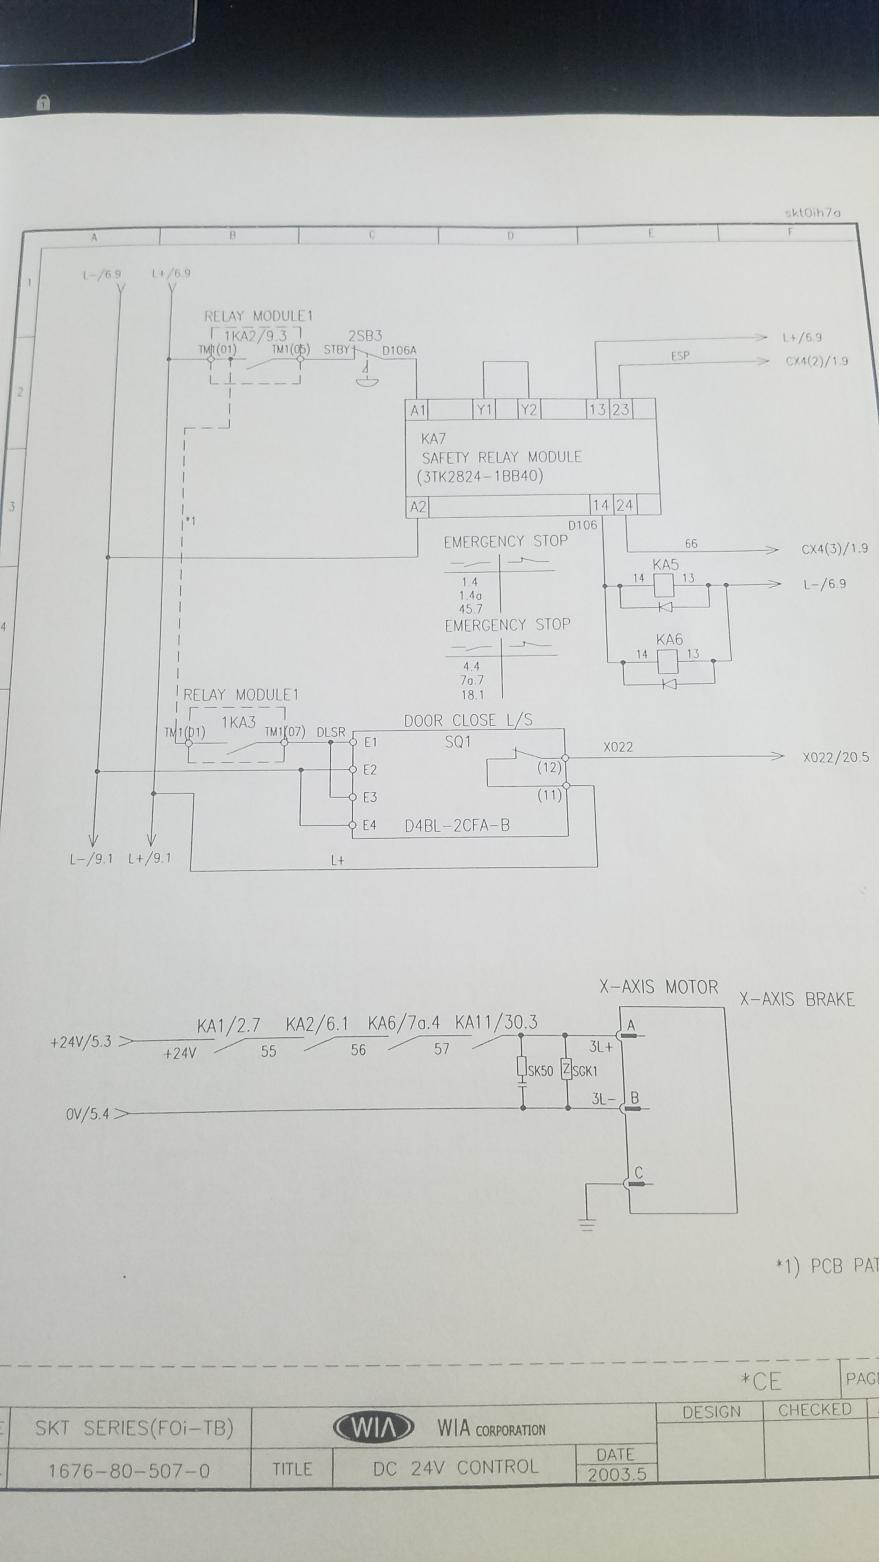 medium resolution of fanuc 0i tb on kia skt21lms 410 servo alarm b axis excess error servo alarm diagram